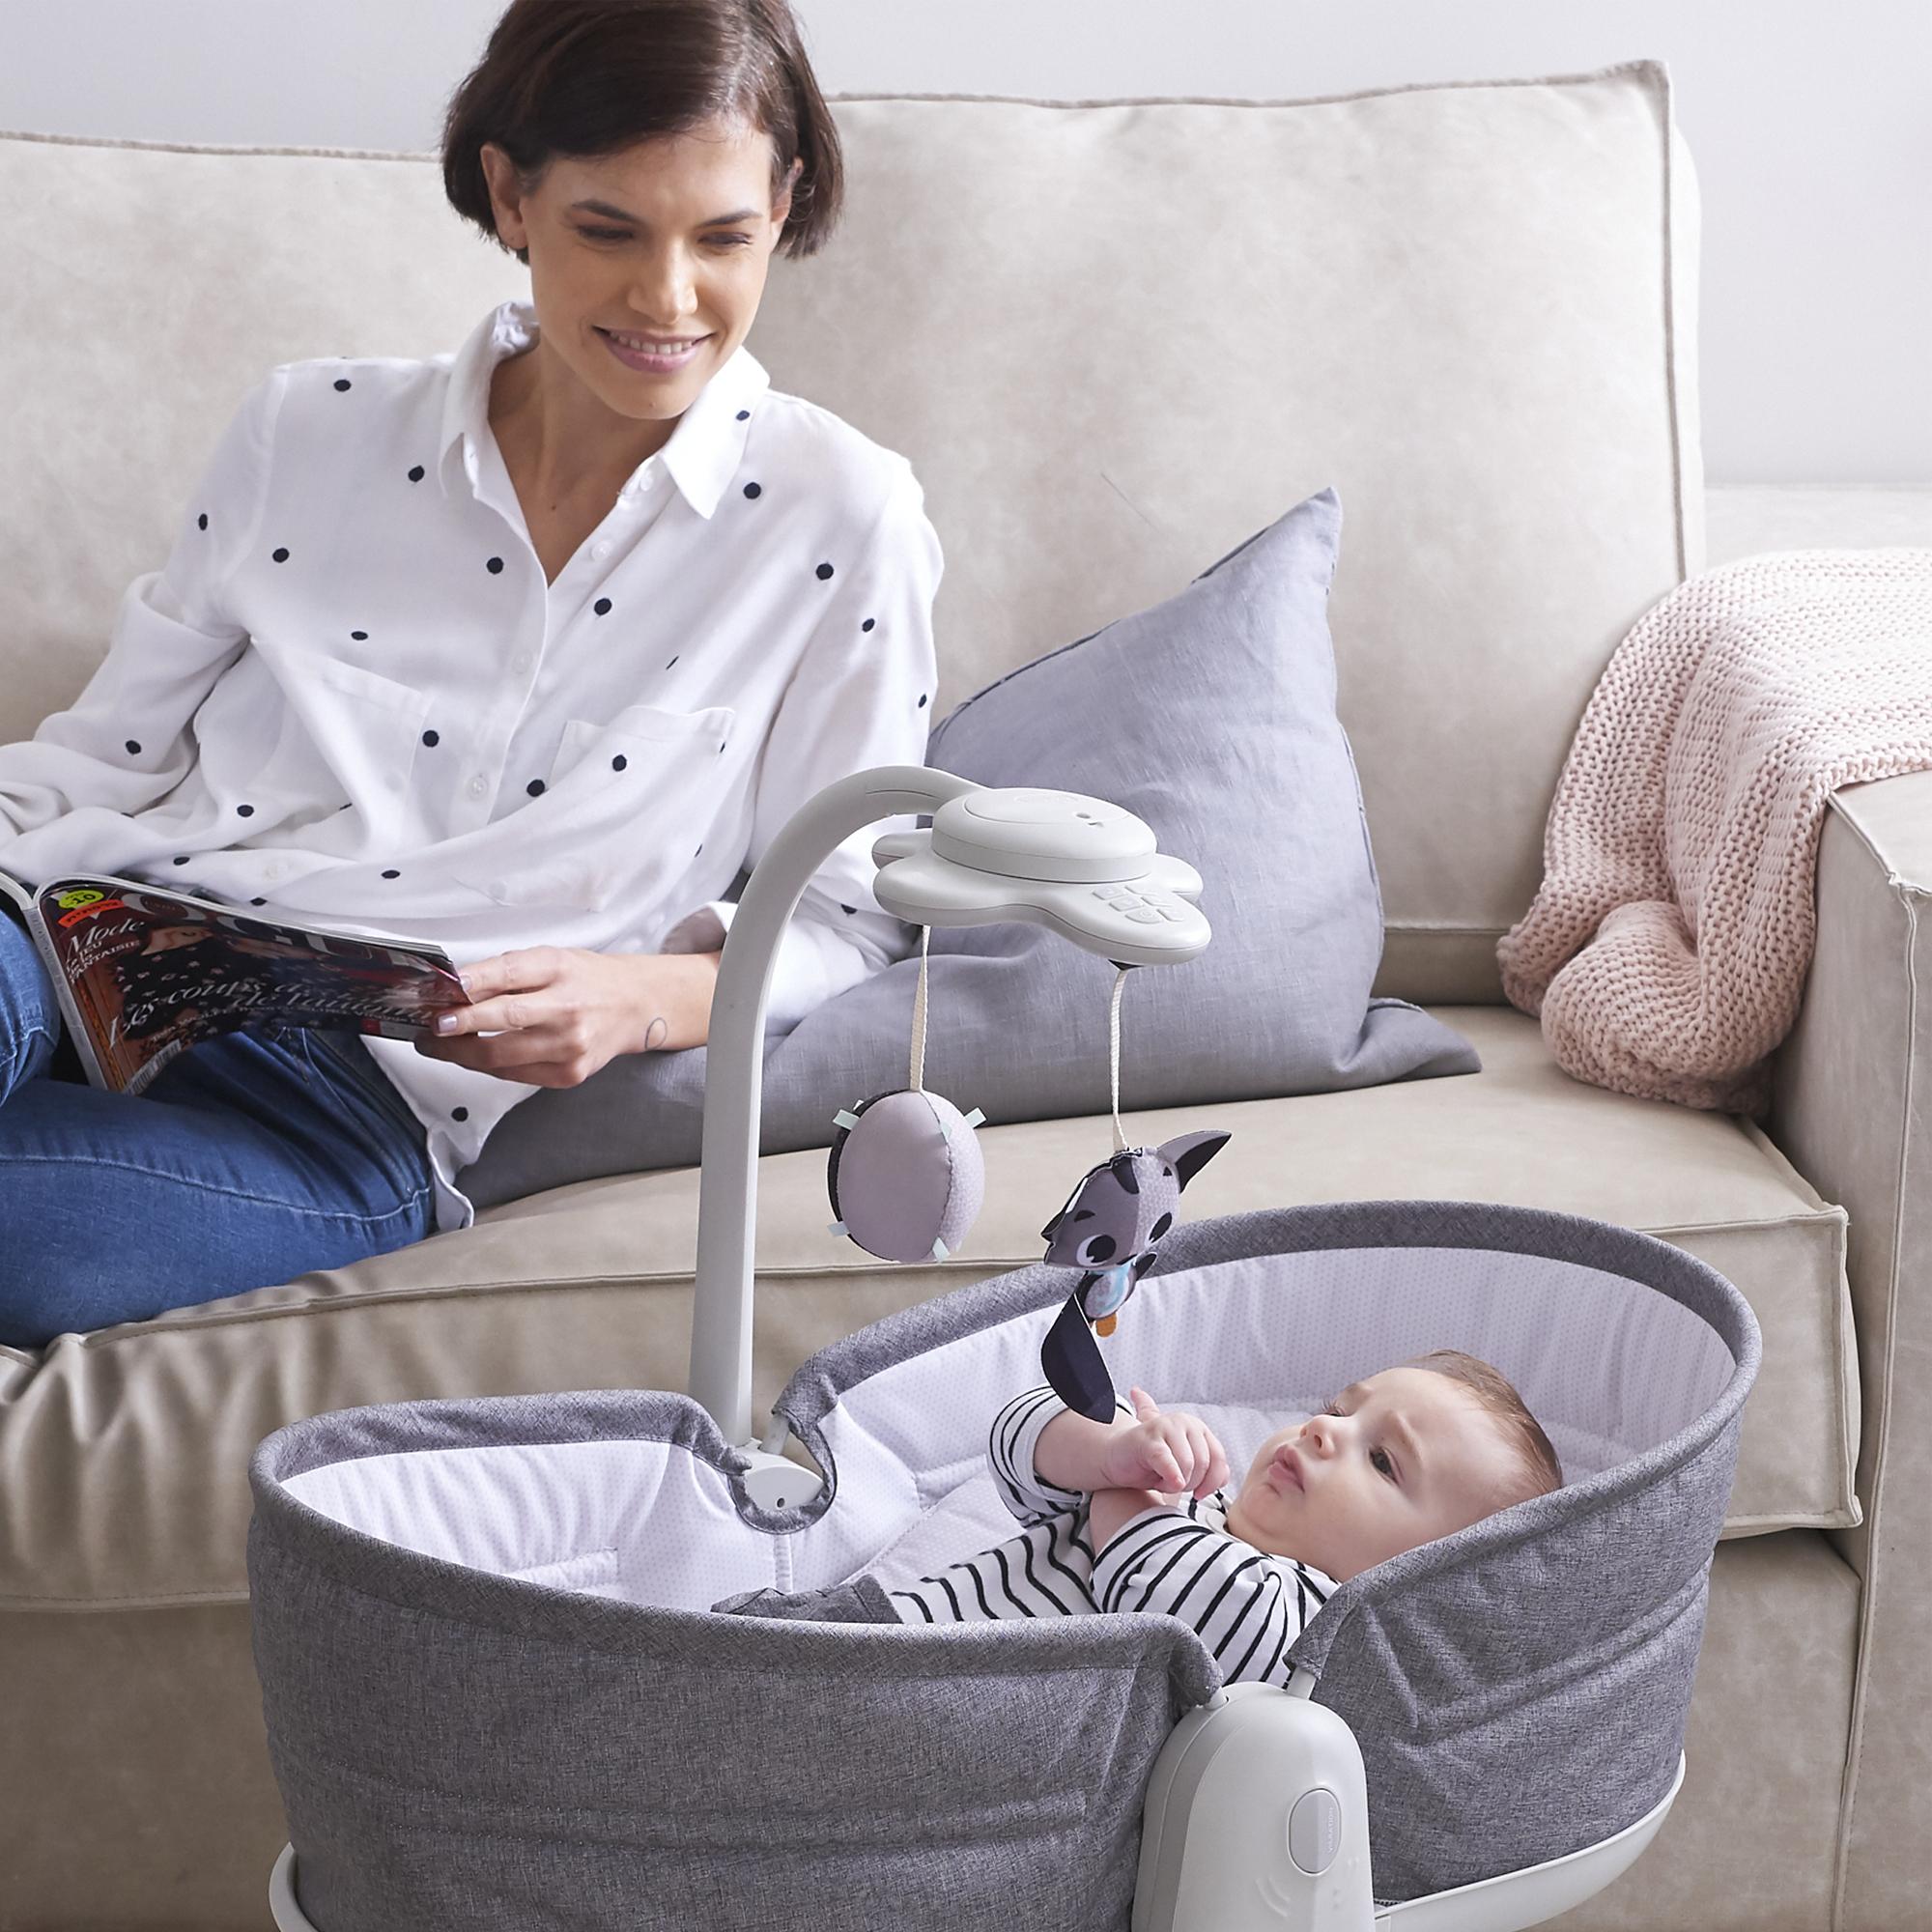 abilitati motorii bebe